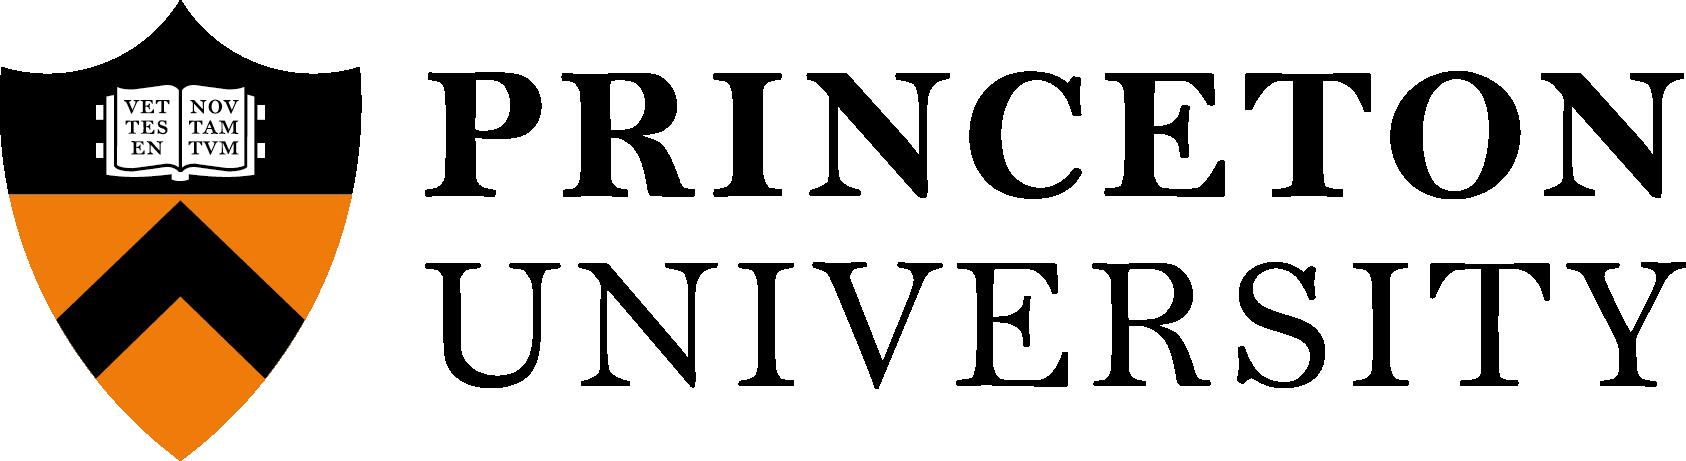 princeton-university-logo_freelogovectors.net_.png